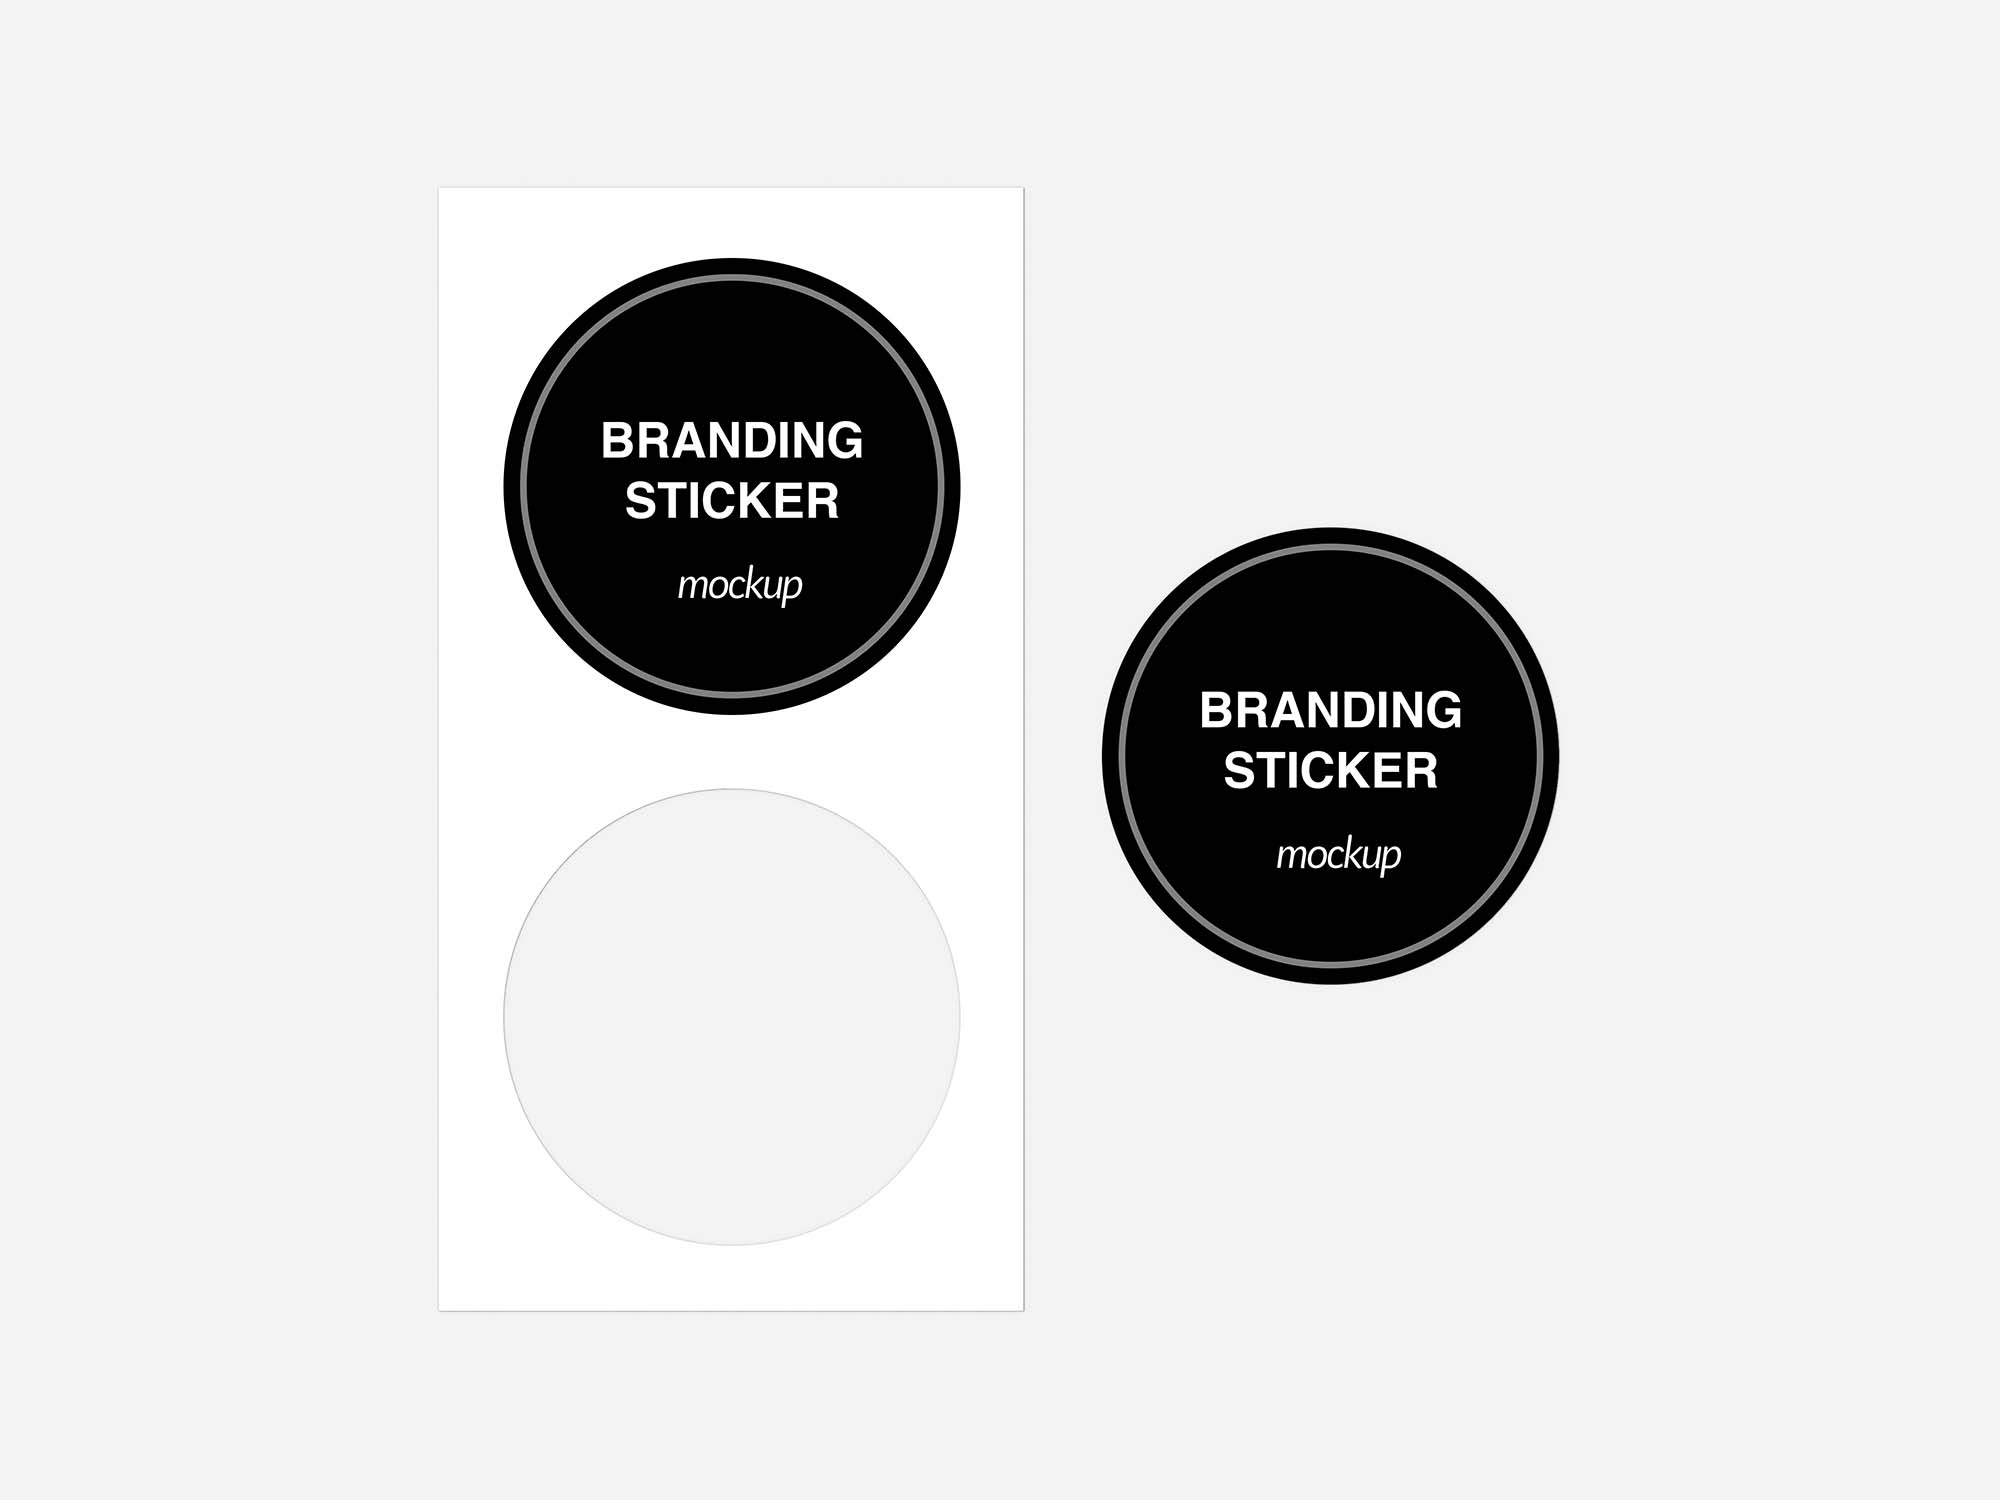 Branding Sticker Mockup 2